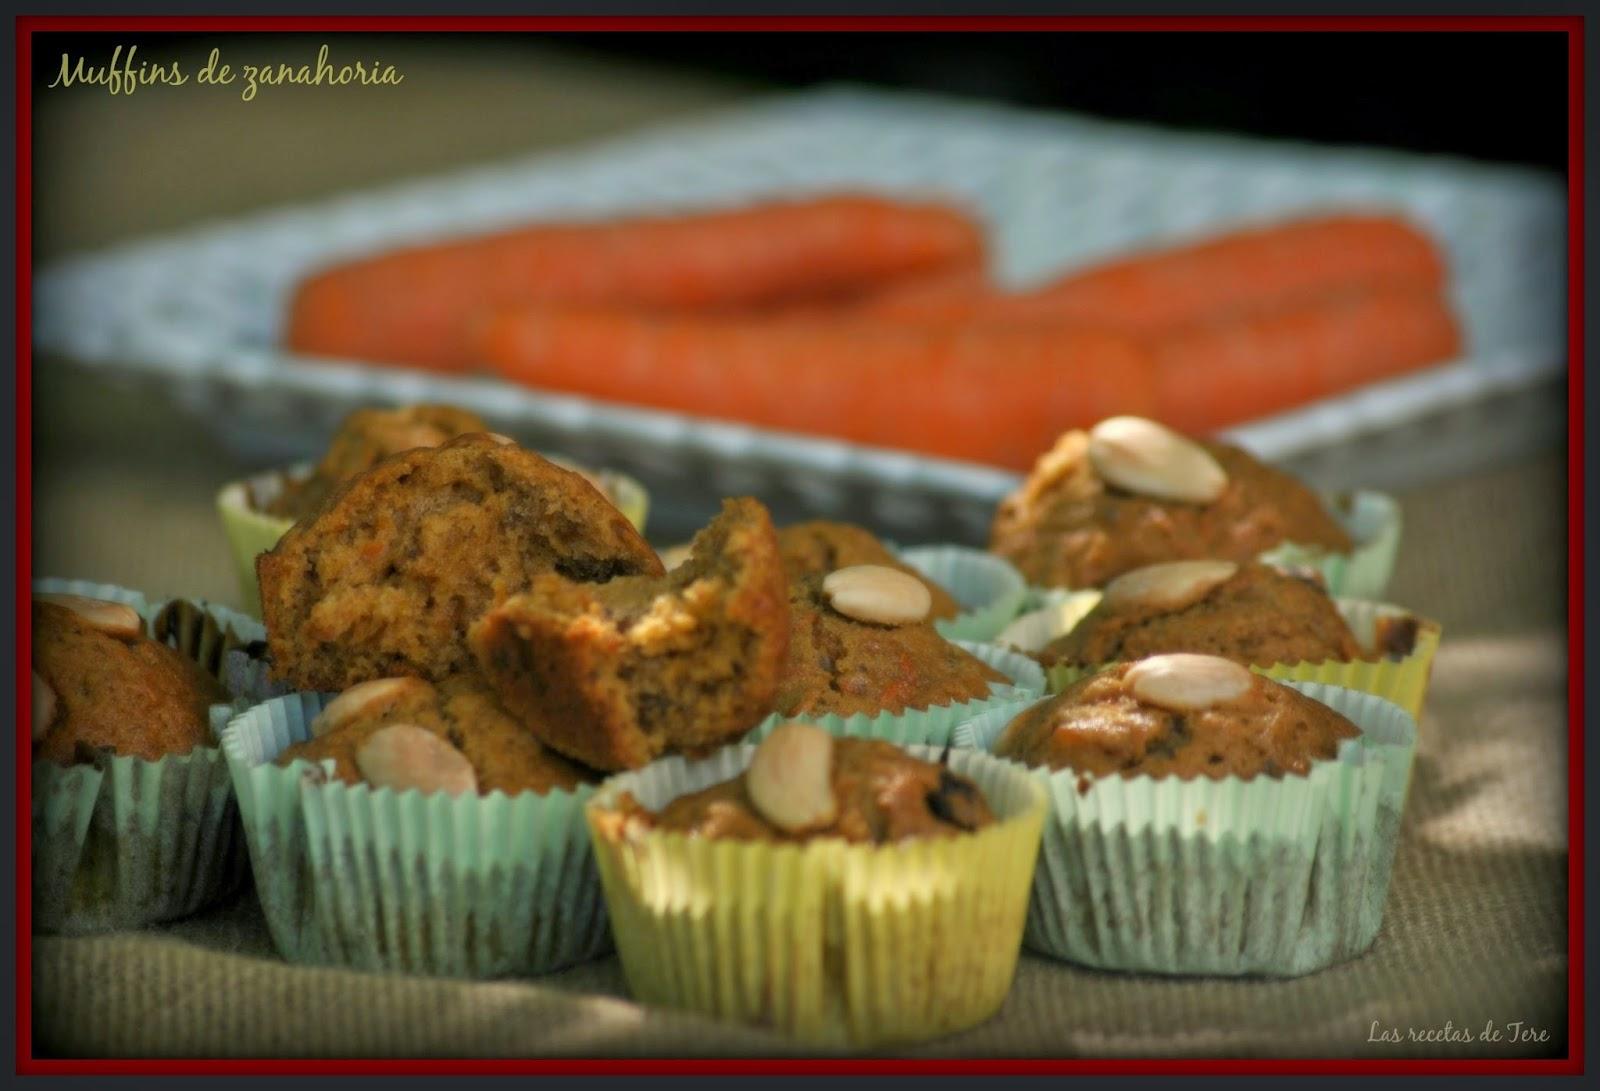 Muffins de zanahoria 02